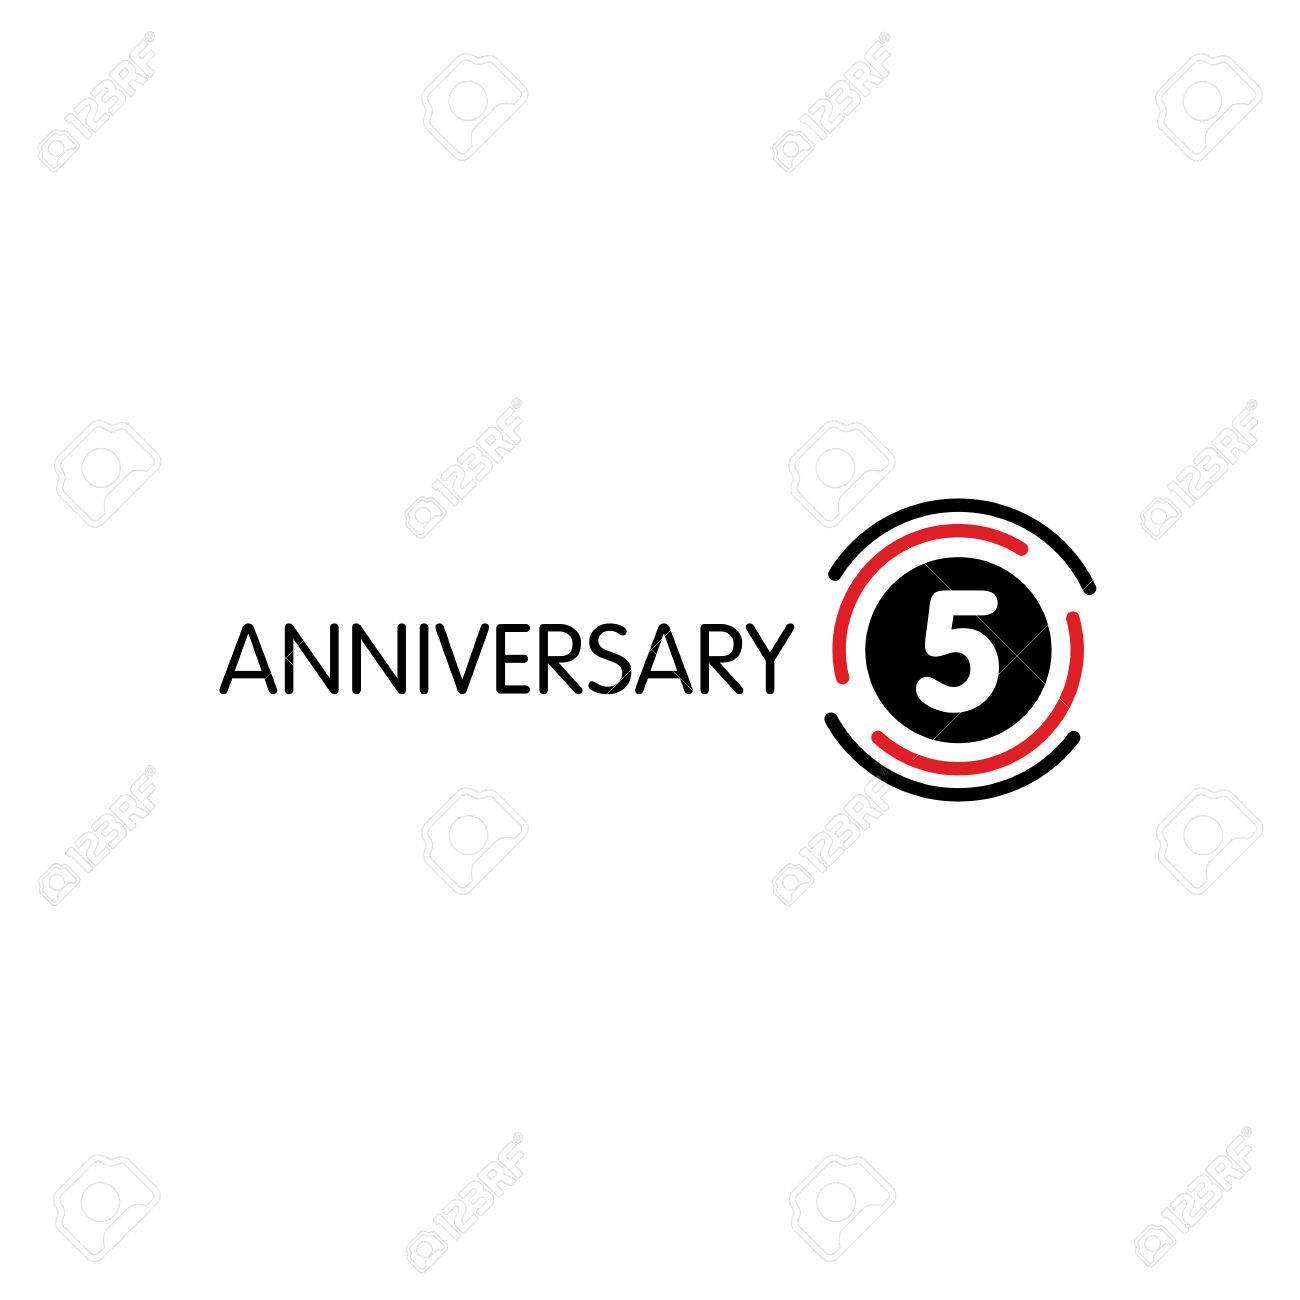 Anniversary vector unusual label fifth anniversary symbol 5 anniversary vector unusual label fifth anniversary symbol 5 years birthday abstract logo the biocorpaavc Choice Image